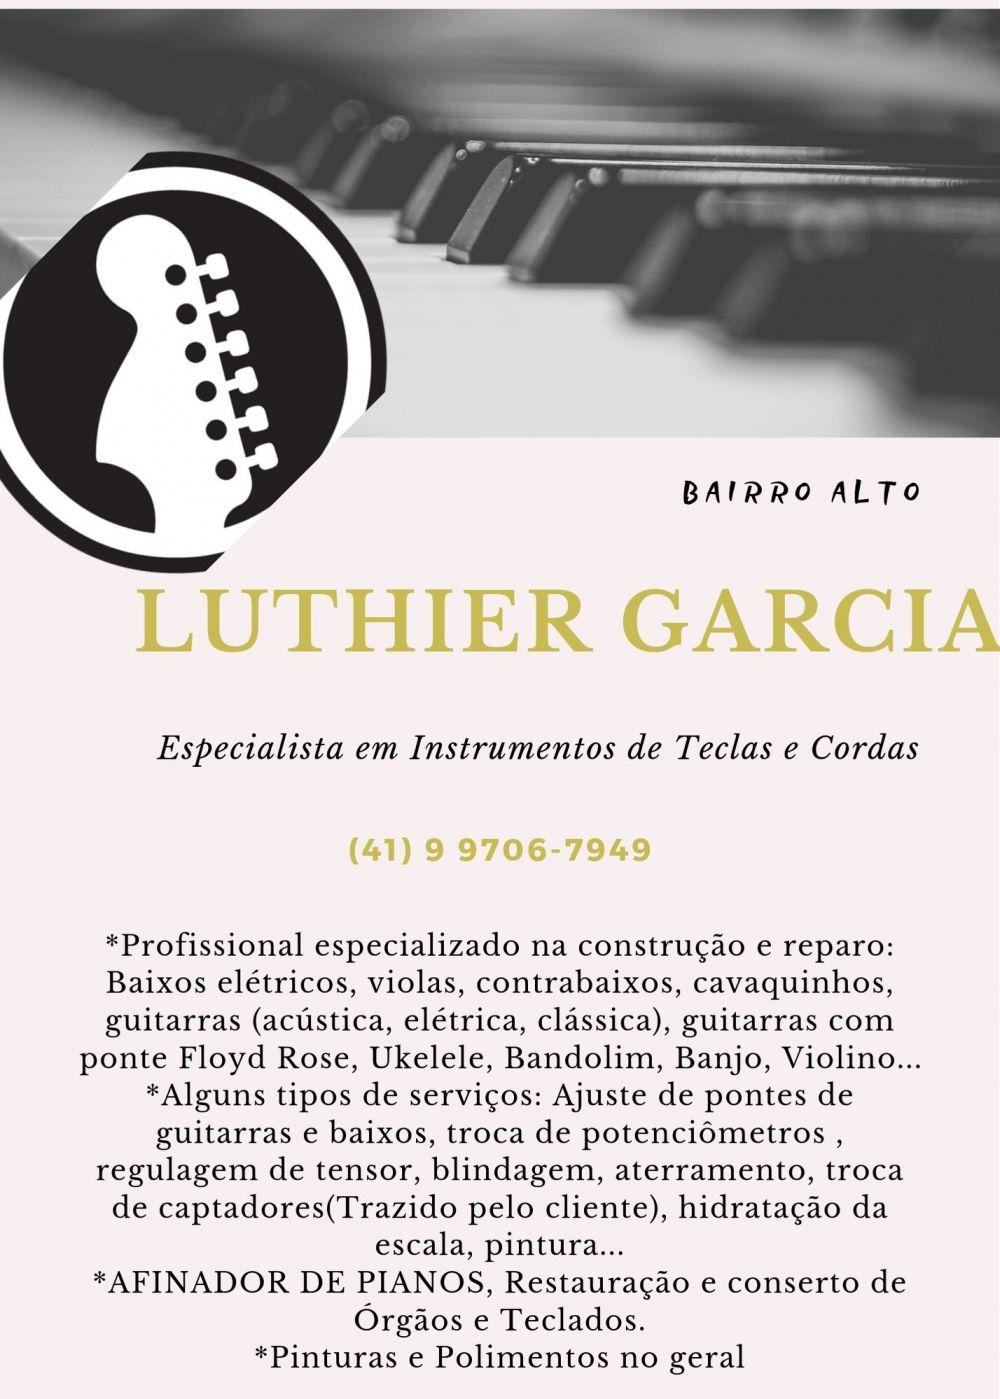 Luthier giovanny garcia